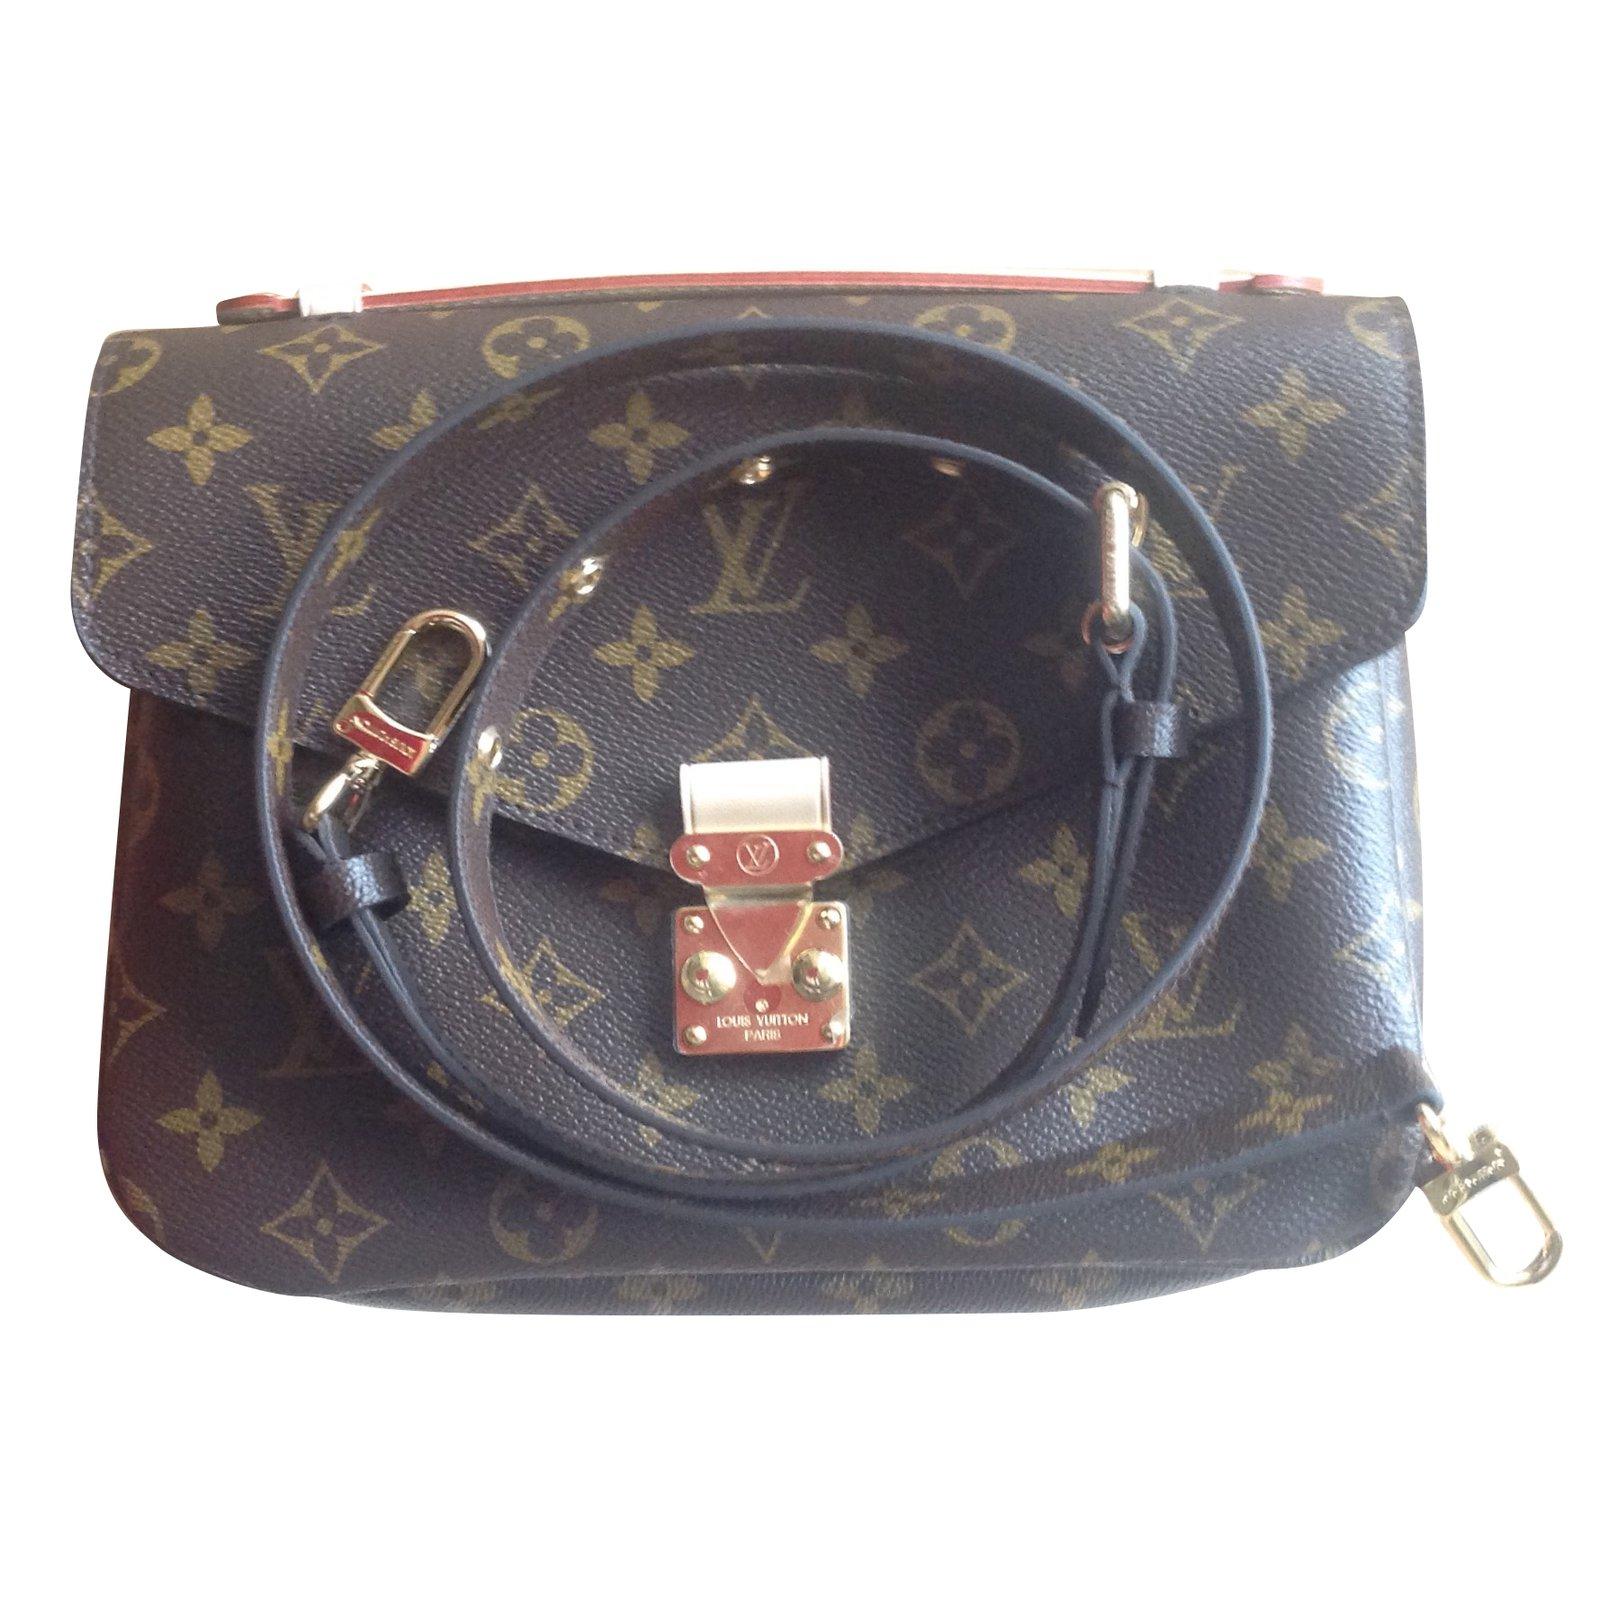 Louis Vuitton Pochette Metis Handbags Patent Leather Brown Ref 54515